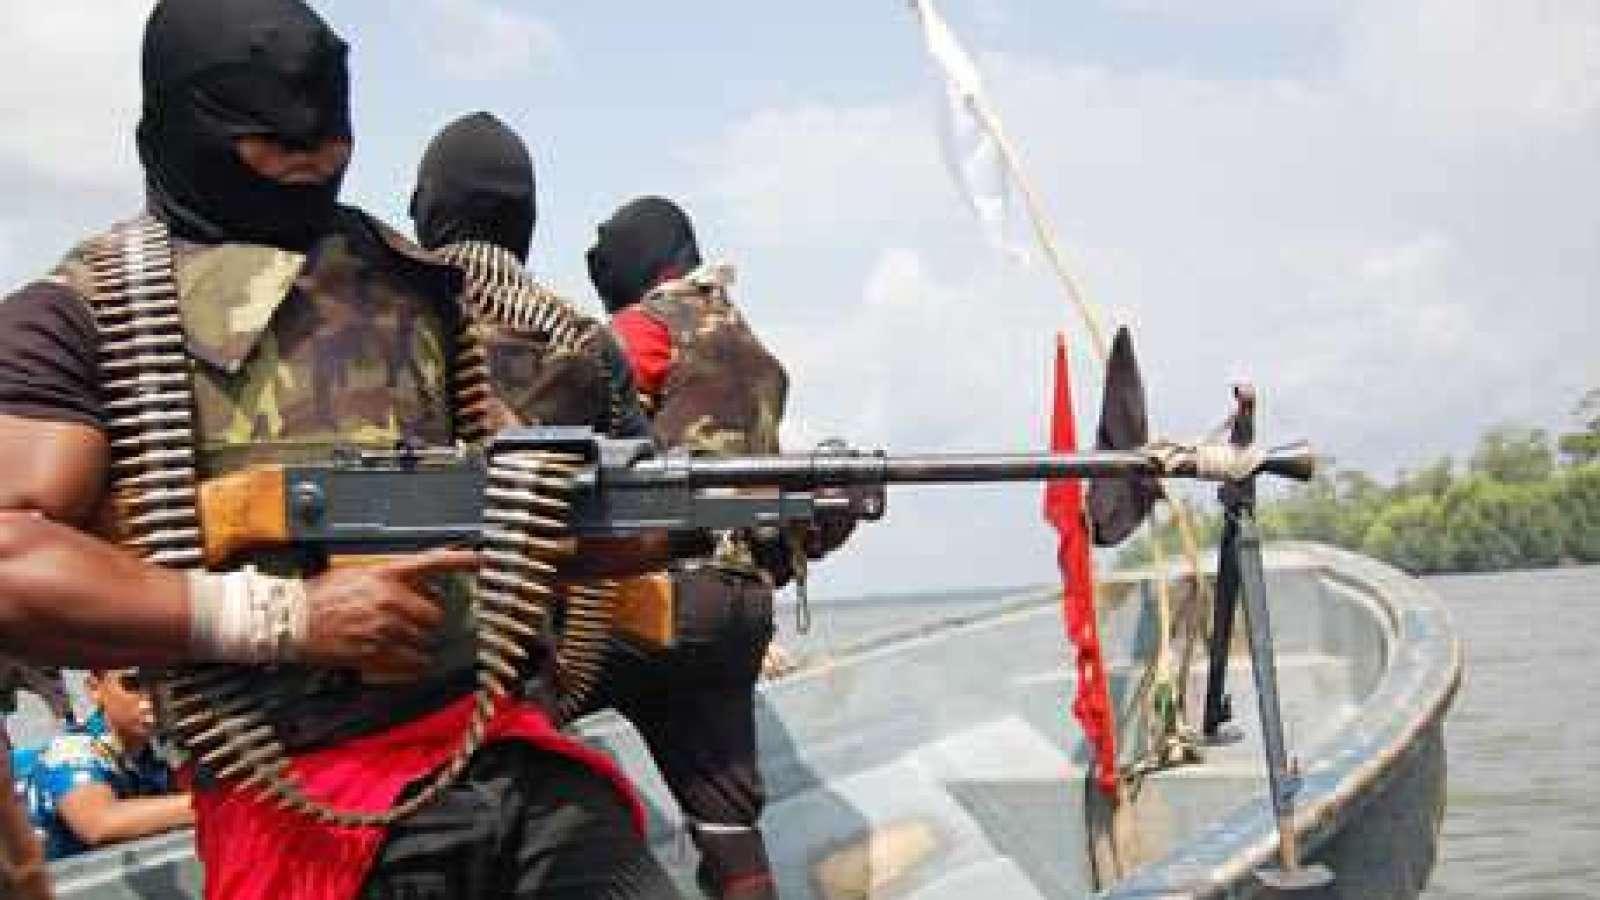 https://i0.wp.com/www.guardiannewsusa.com/wp-content/uploads/2016/05/Niger-Delta-Militants.jpg